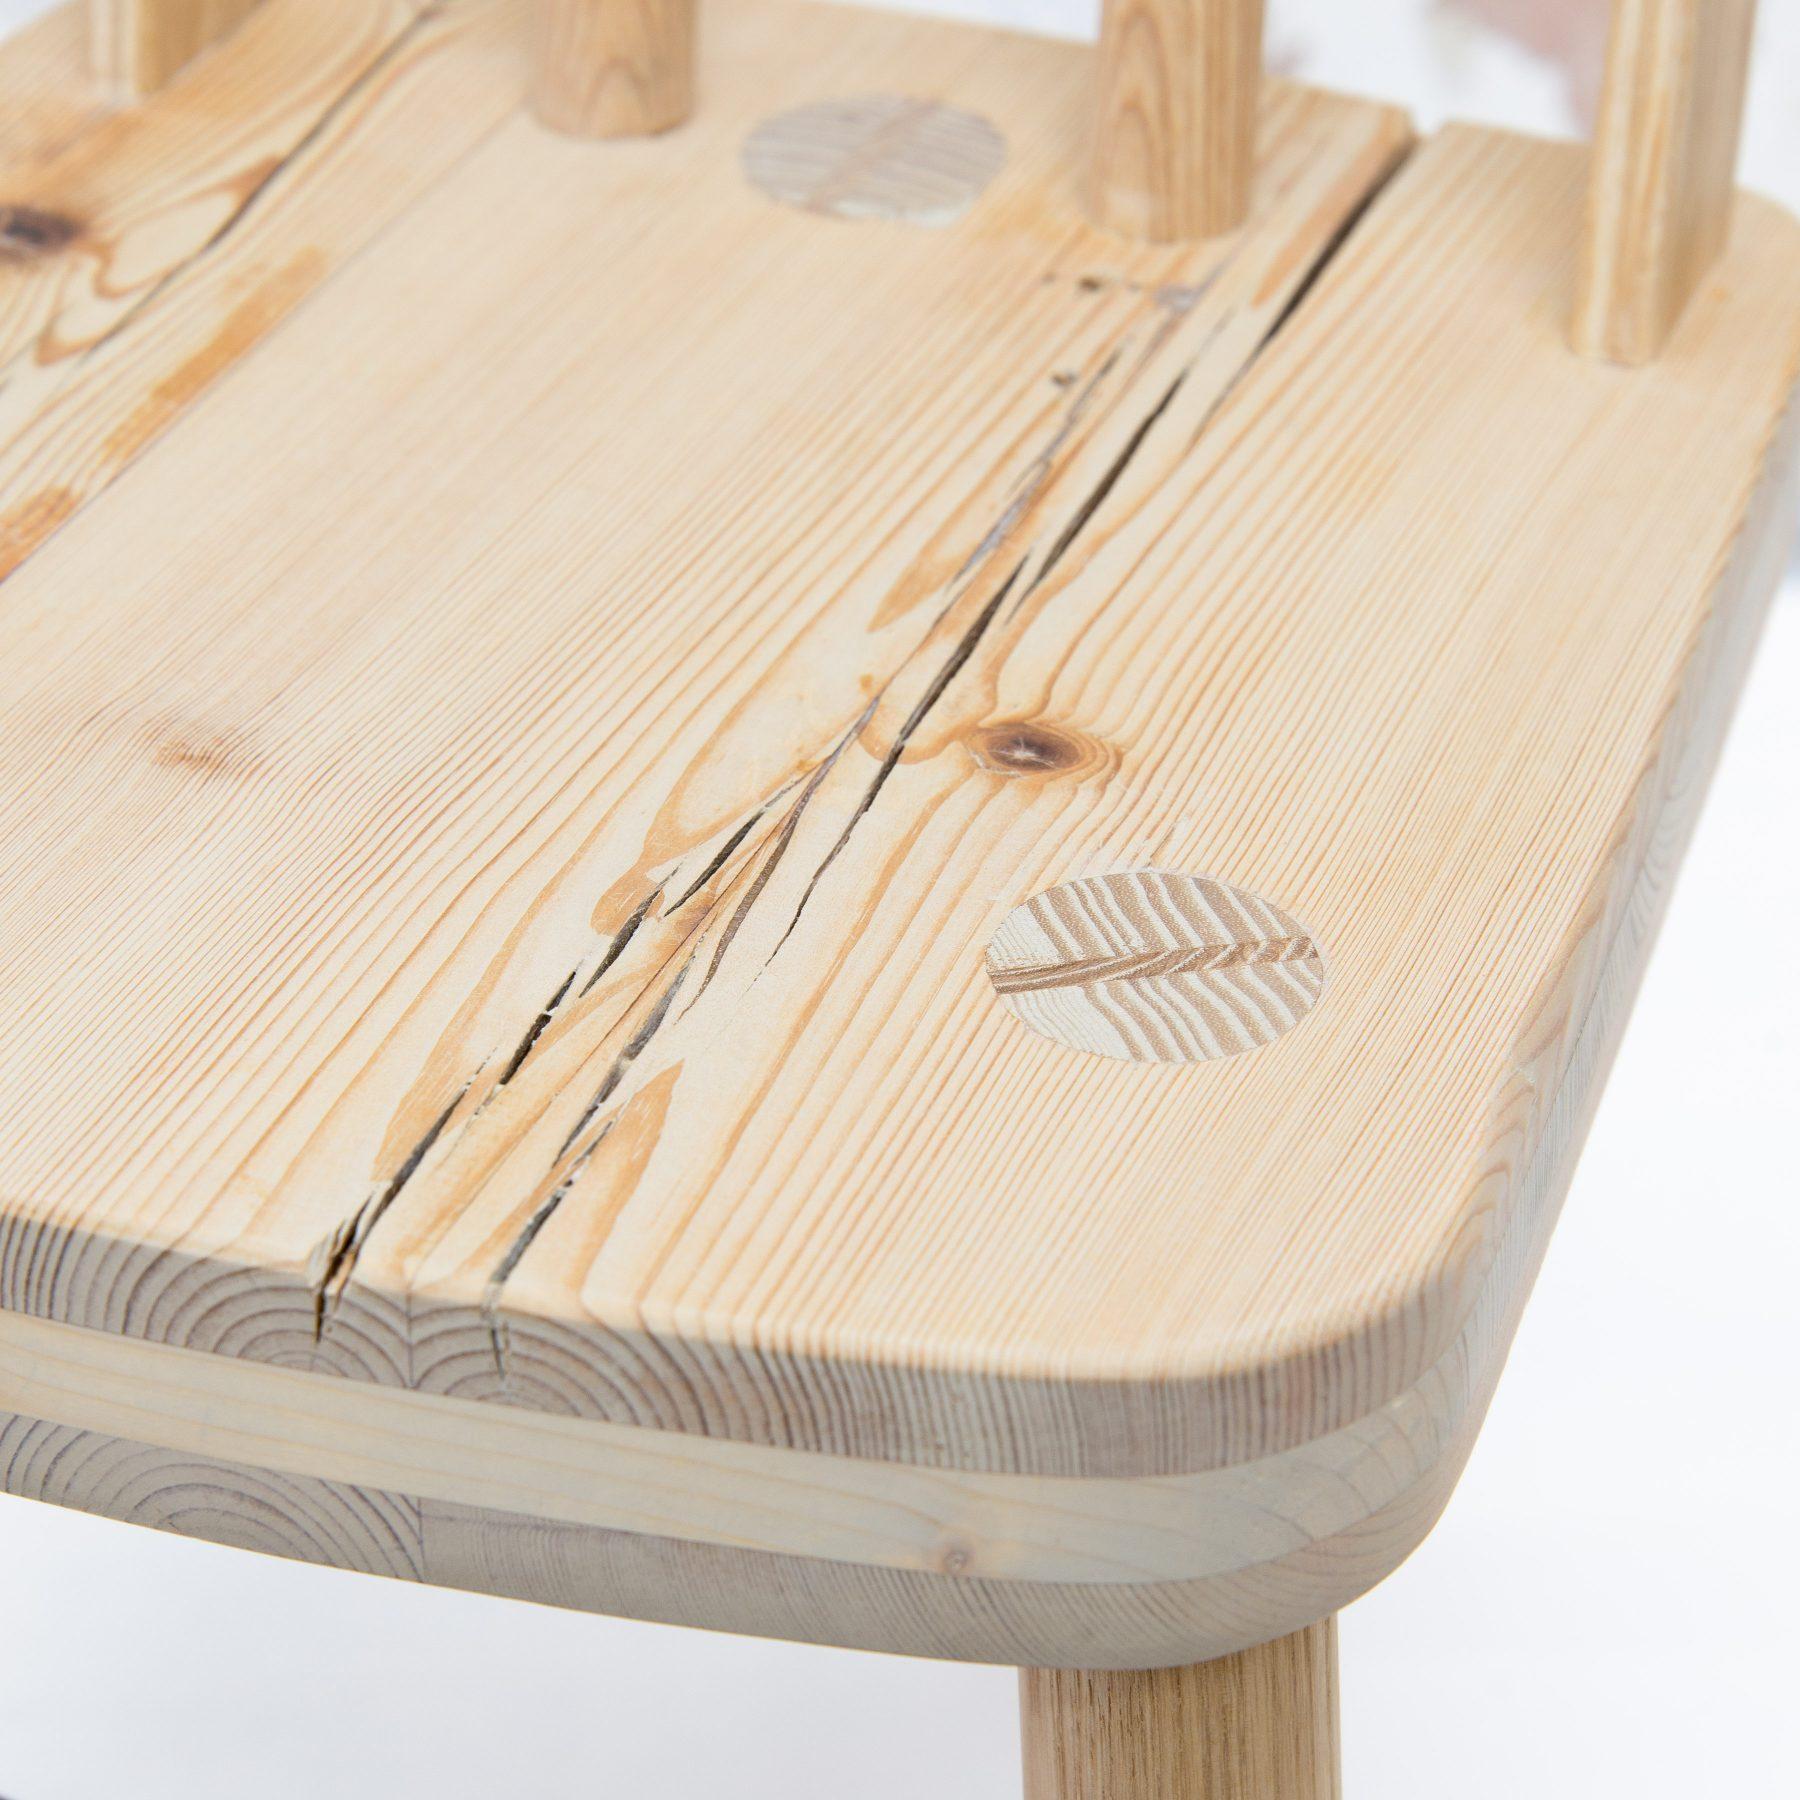 Jan Hendzel Studio lentini chair-5